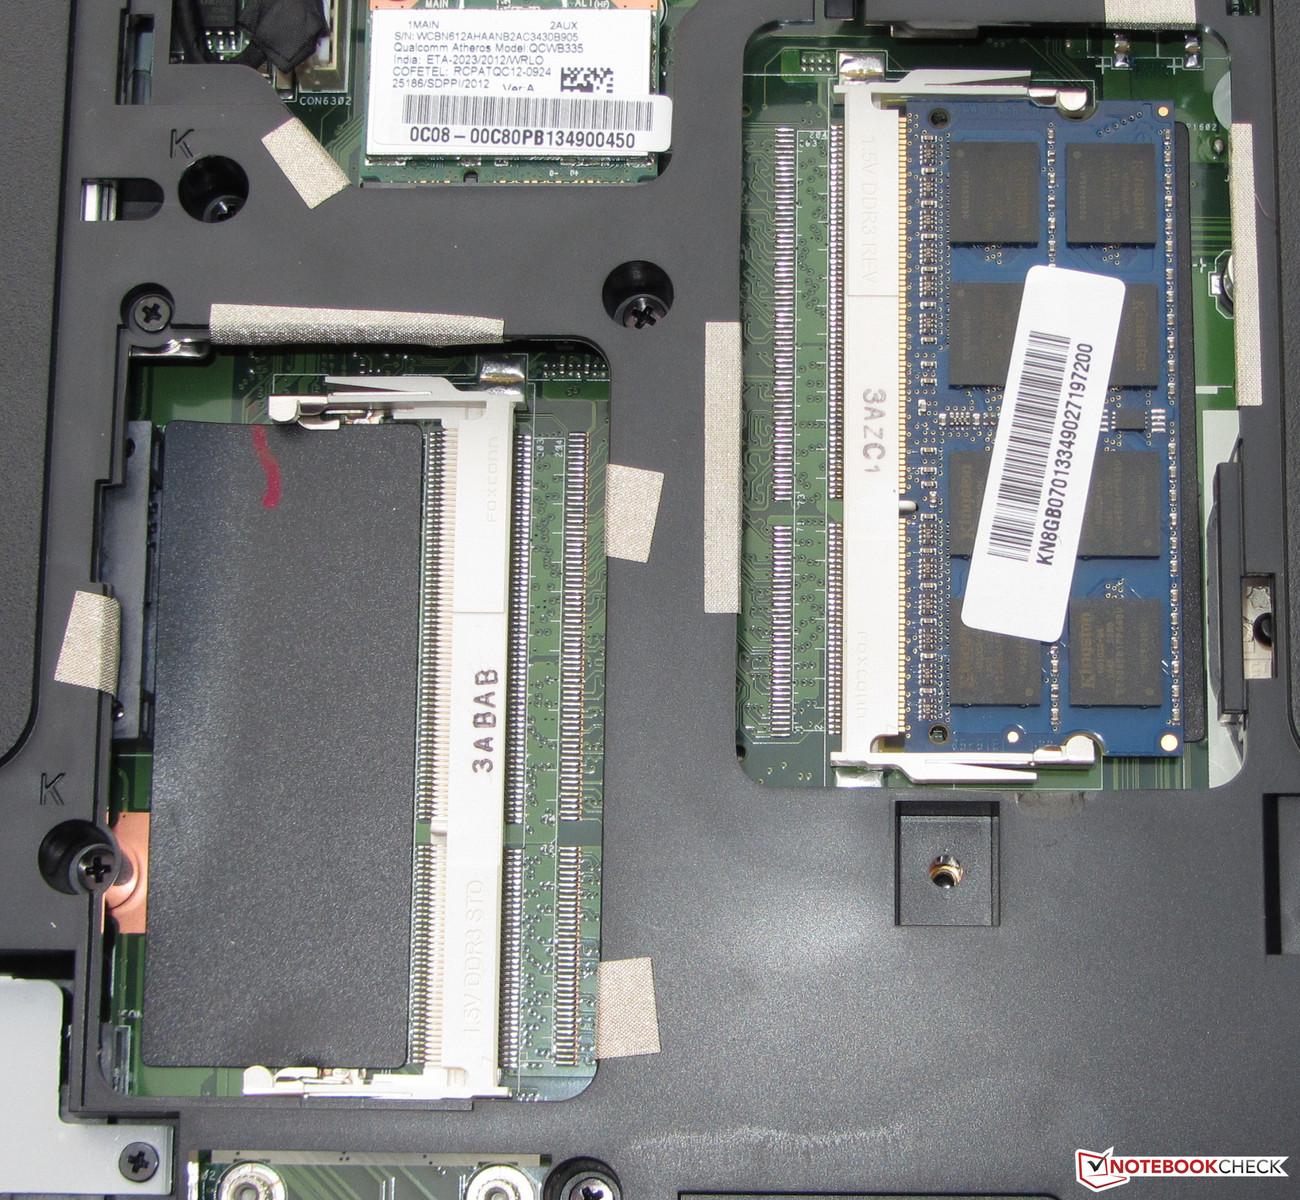 Review Acer Aspire E1-772G 54208G1TMnsk Notebook - NotebookCheck.net Reviews